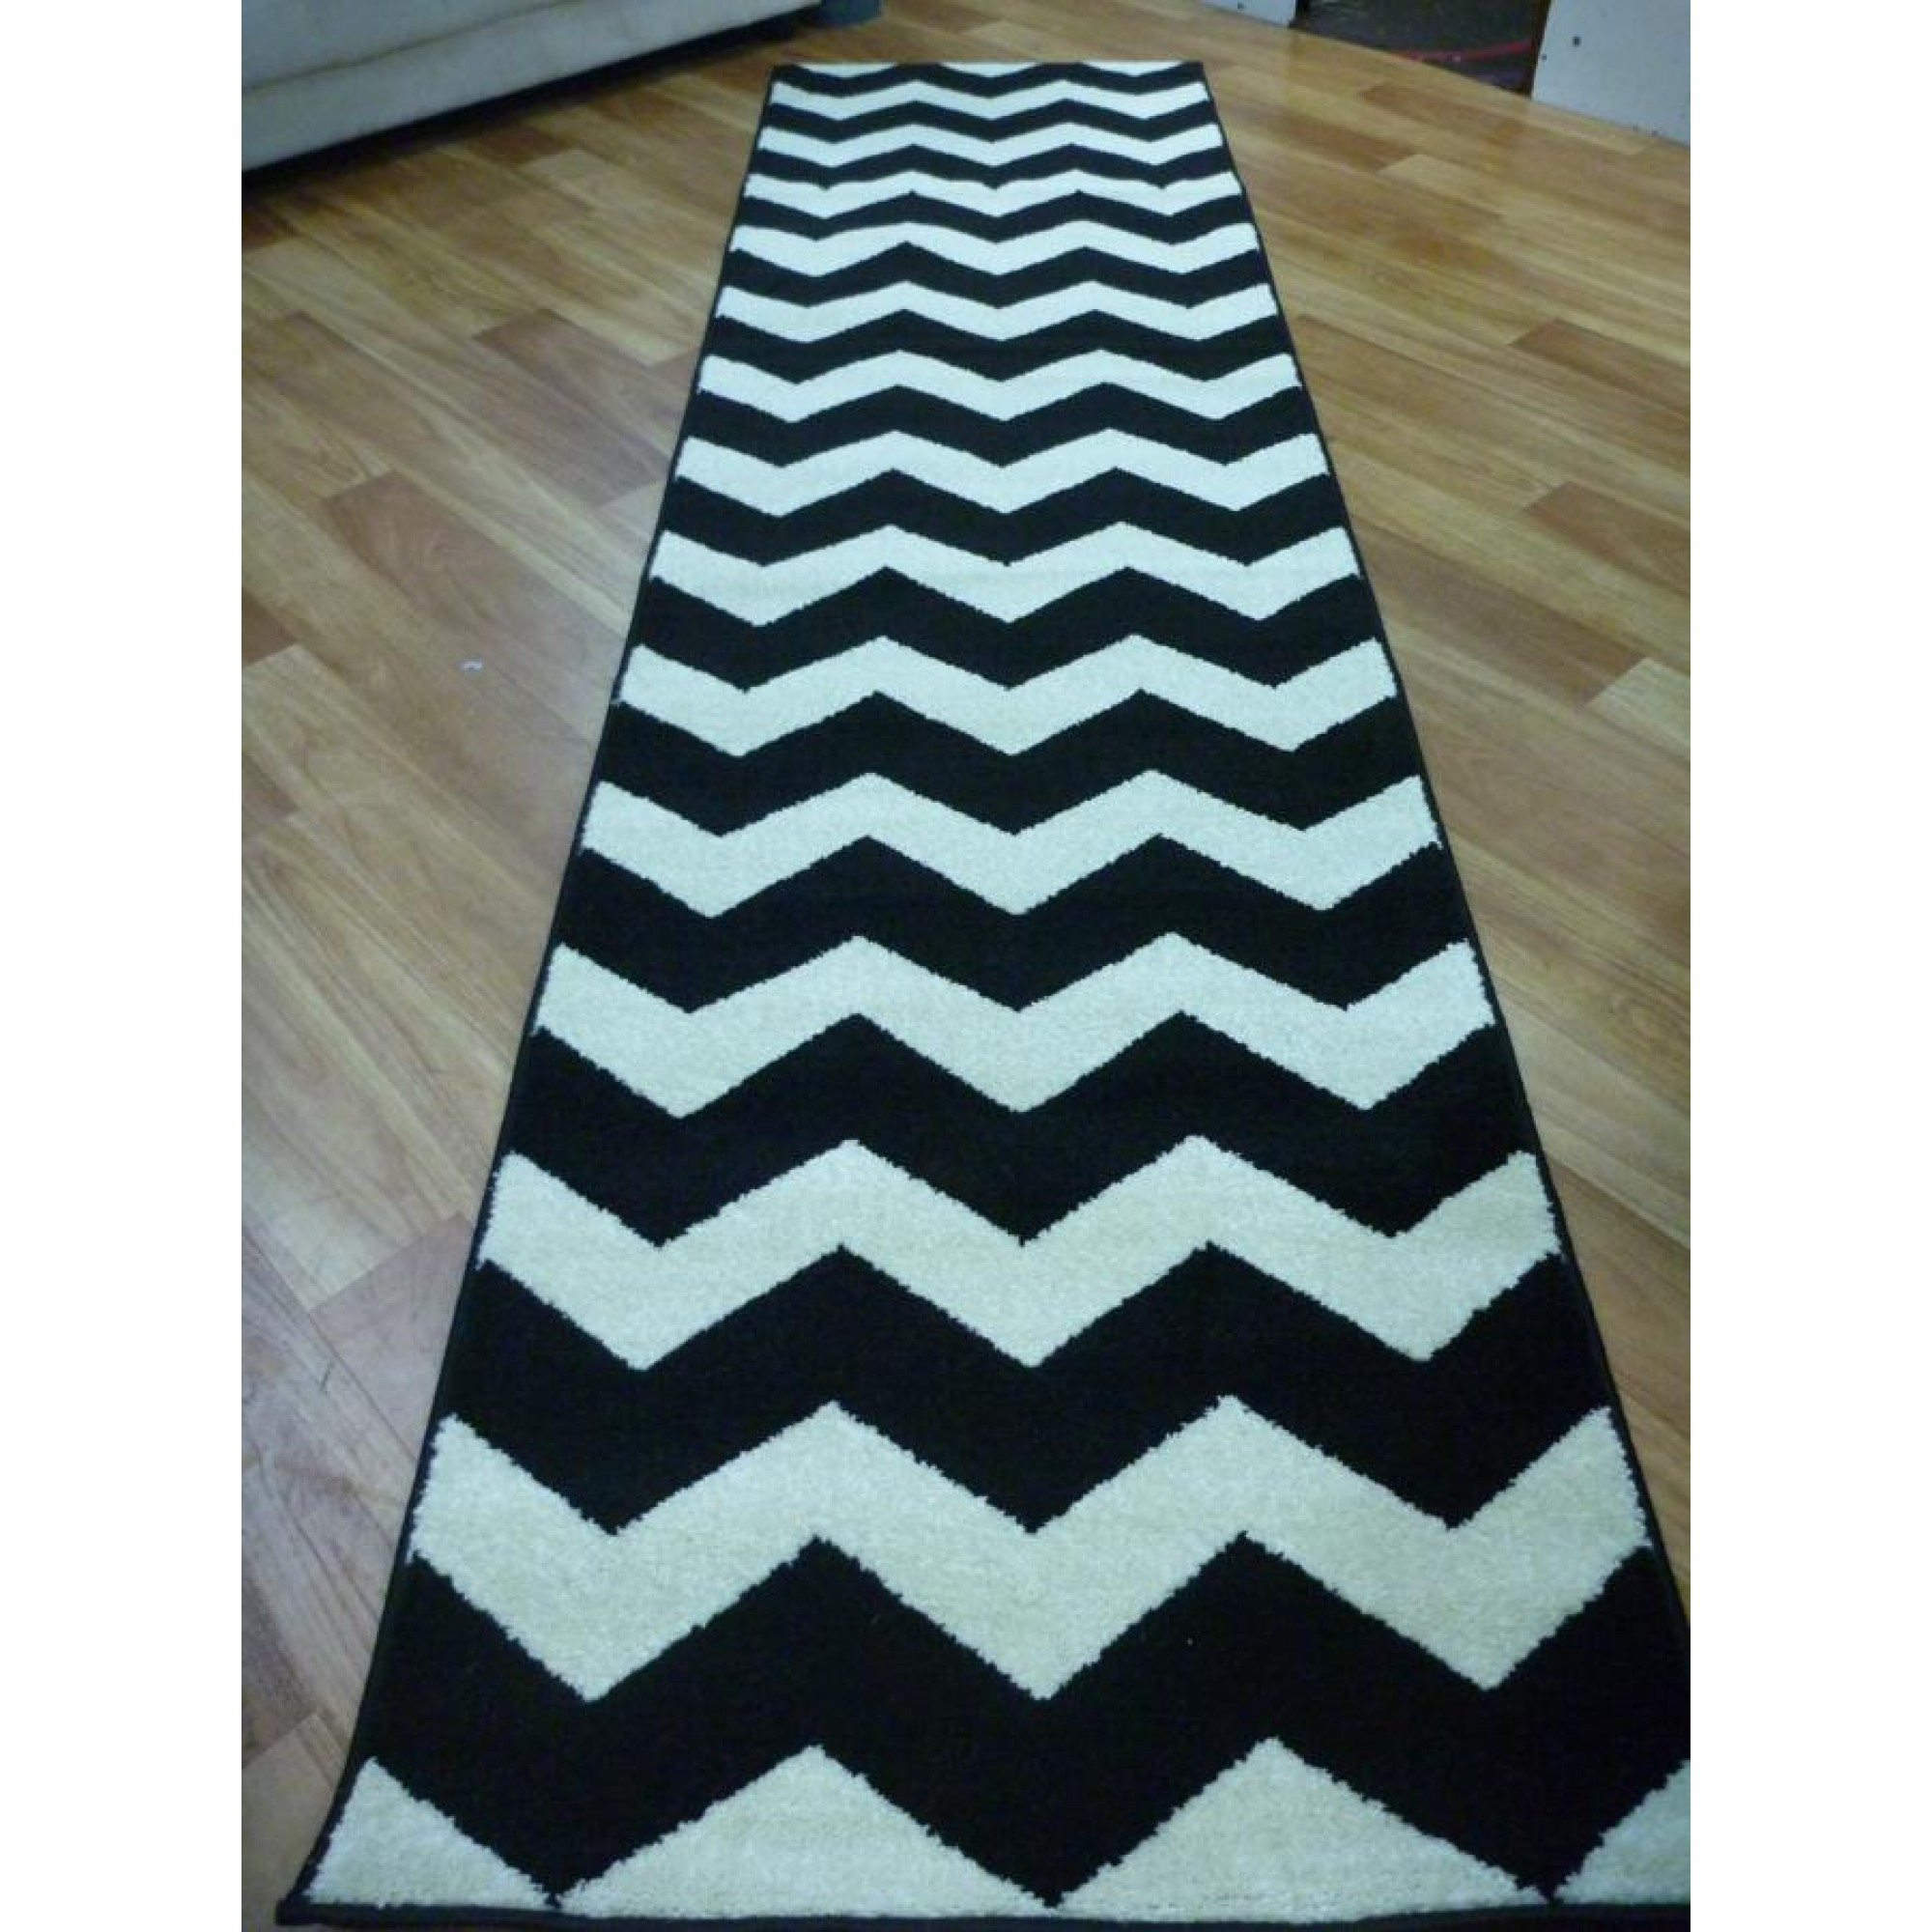 Flooring Lovely Hallway Runners For Floor Decor Idea With Regard To Black Runner Rugs For Hallway (#7 of 20)